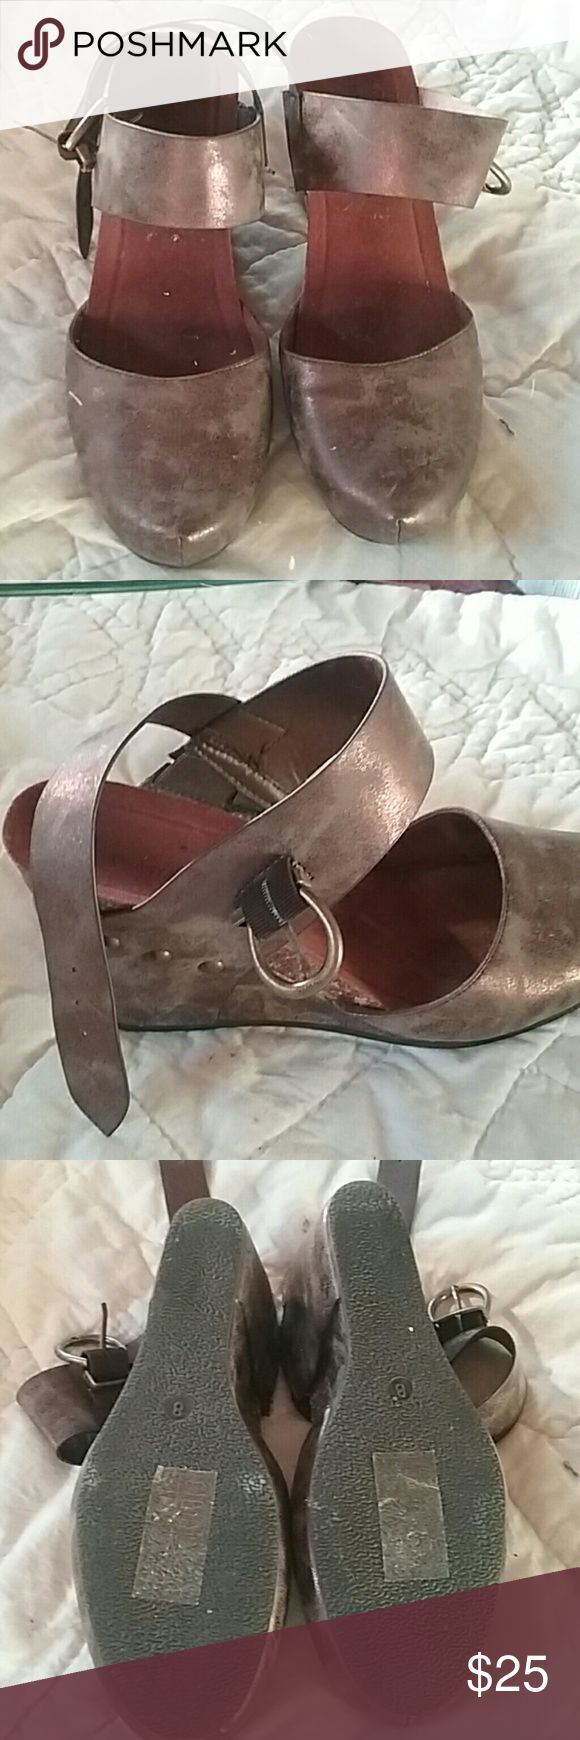 Pierre Dumas shoes Bronze colors wedges.  Only worn once.  Awesome condition!!! Pierre Dumas Shoes Wedges